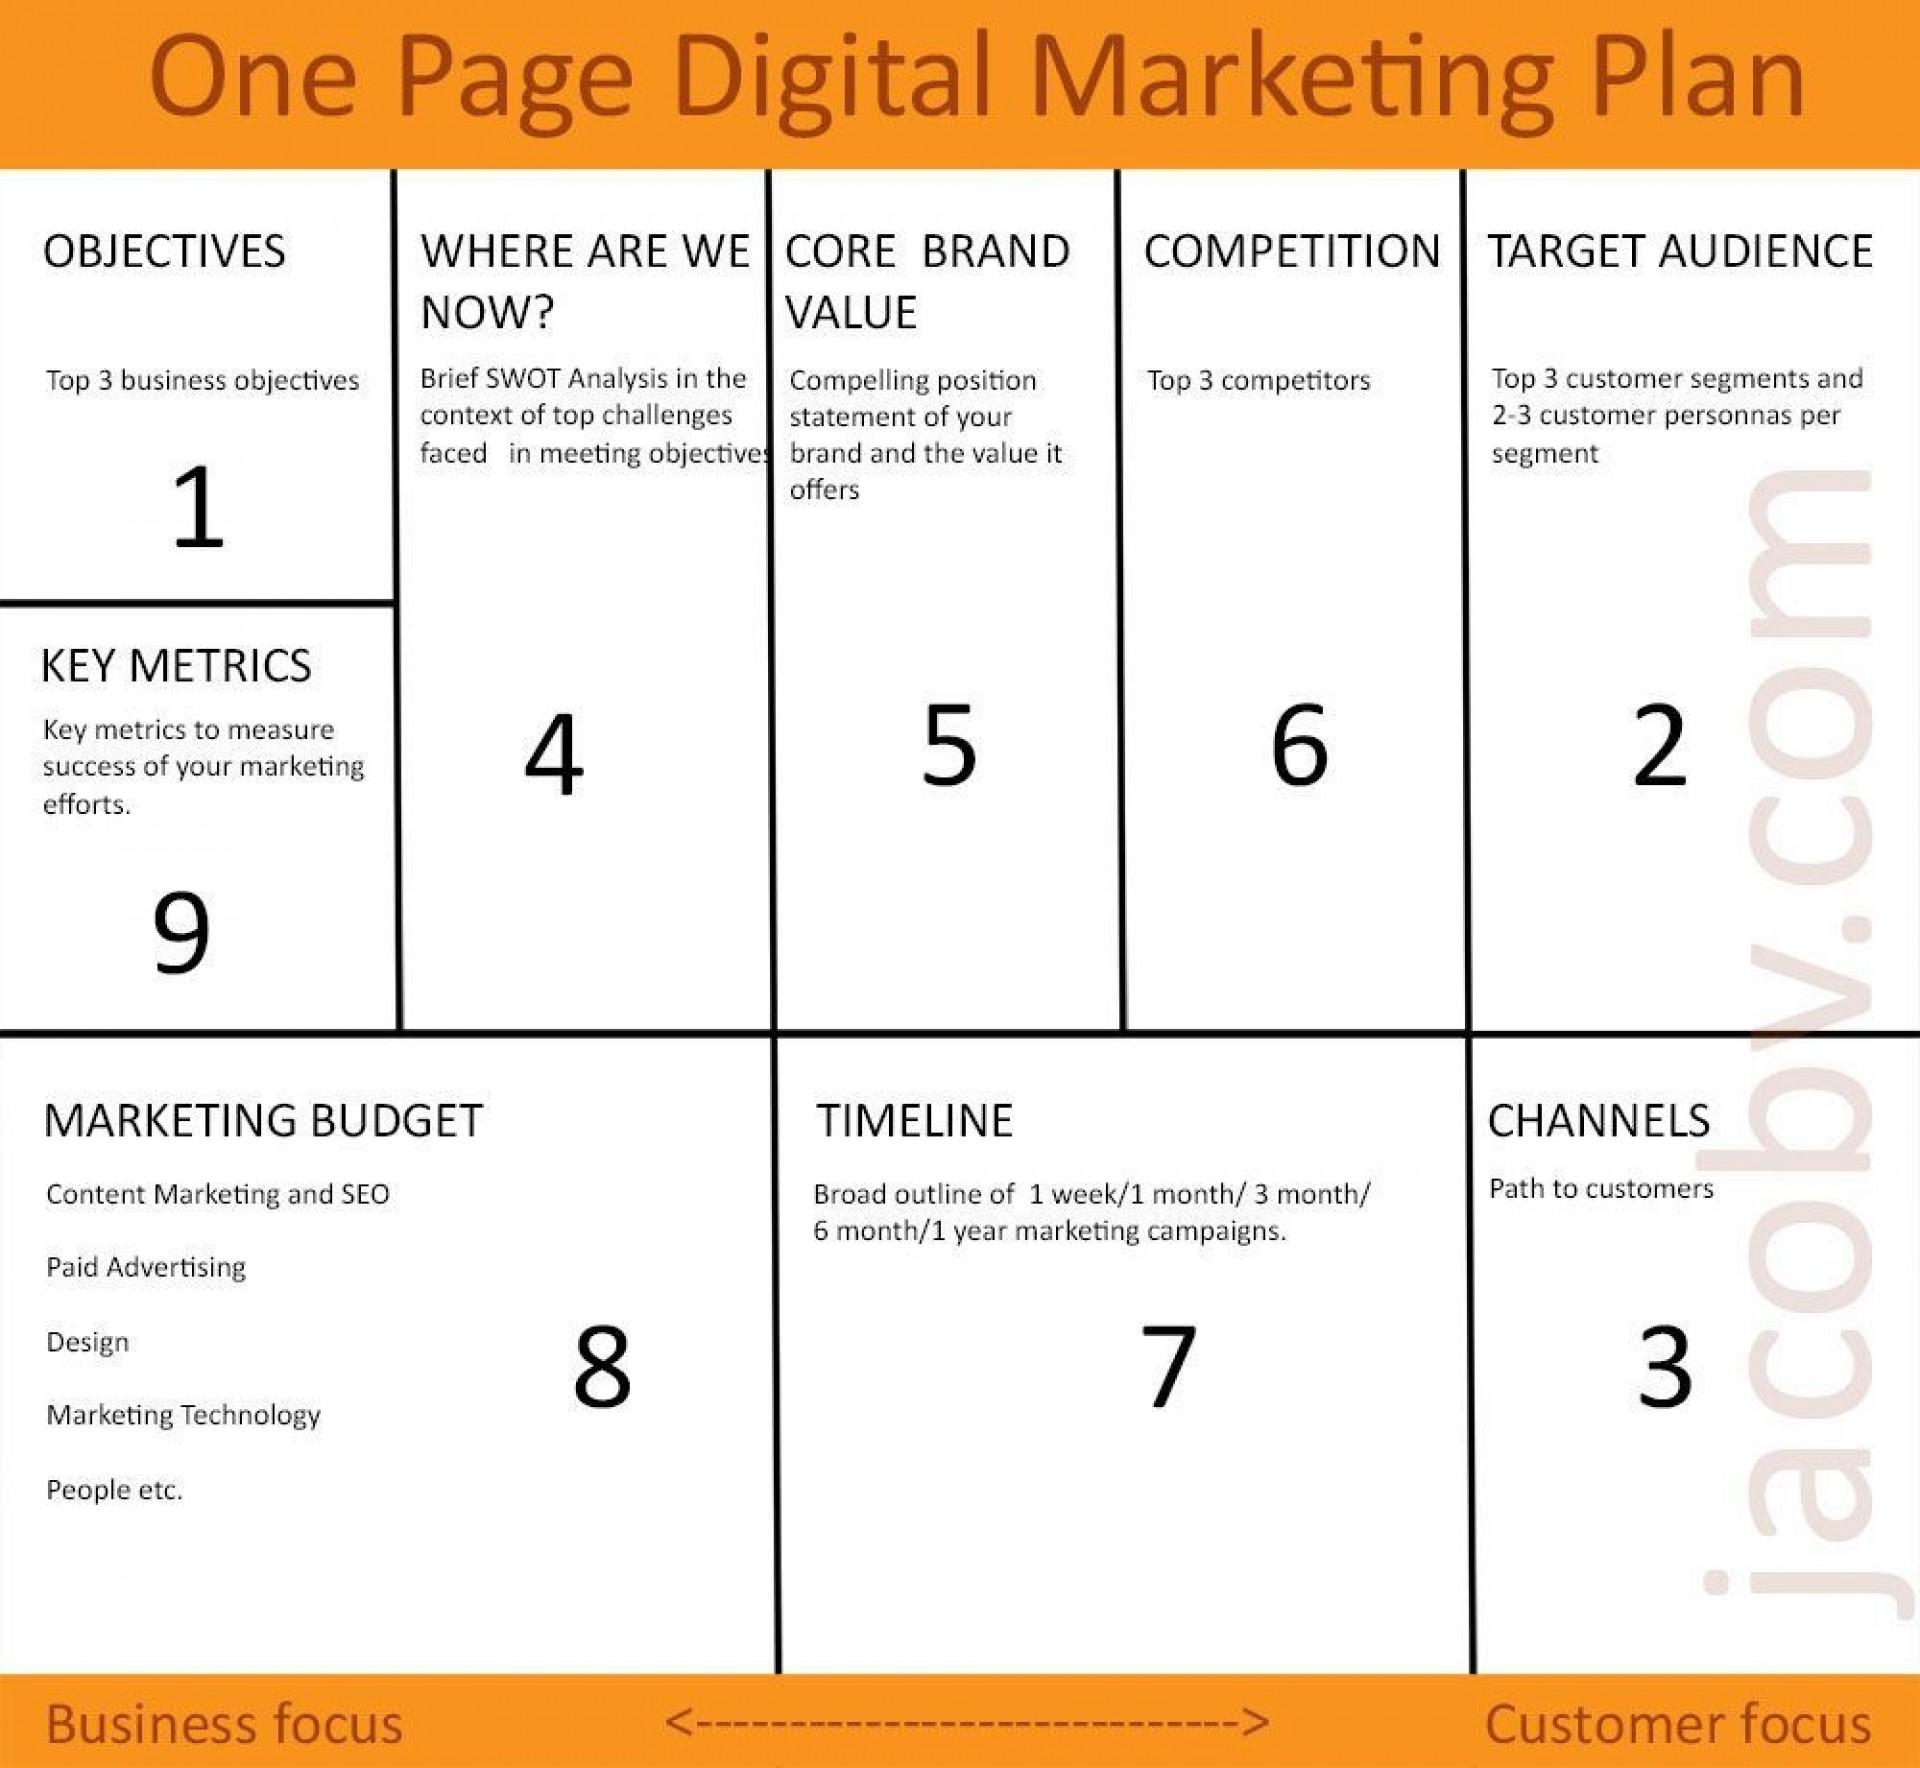 002 Simple Digital Marketing Plan Template Download Inspiration 1920